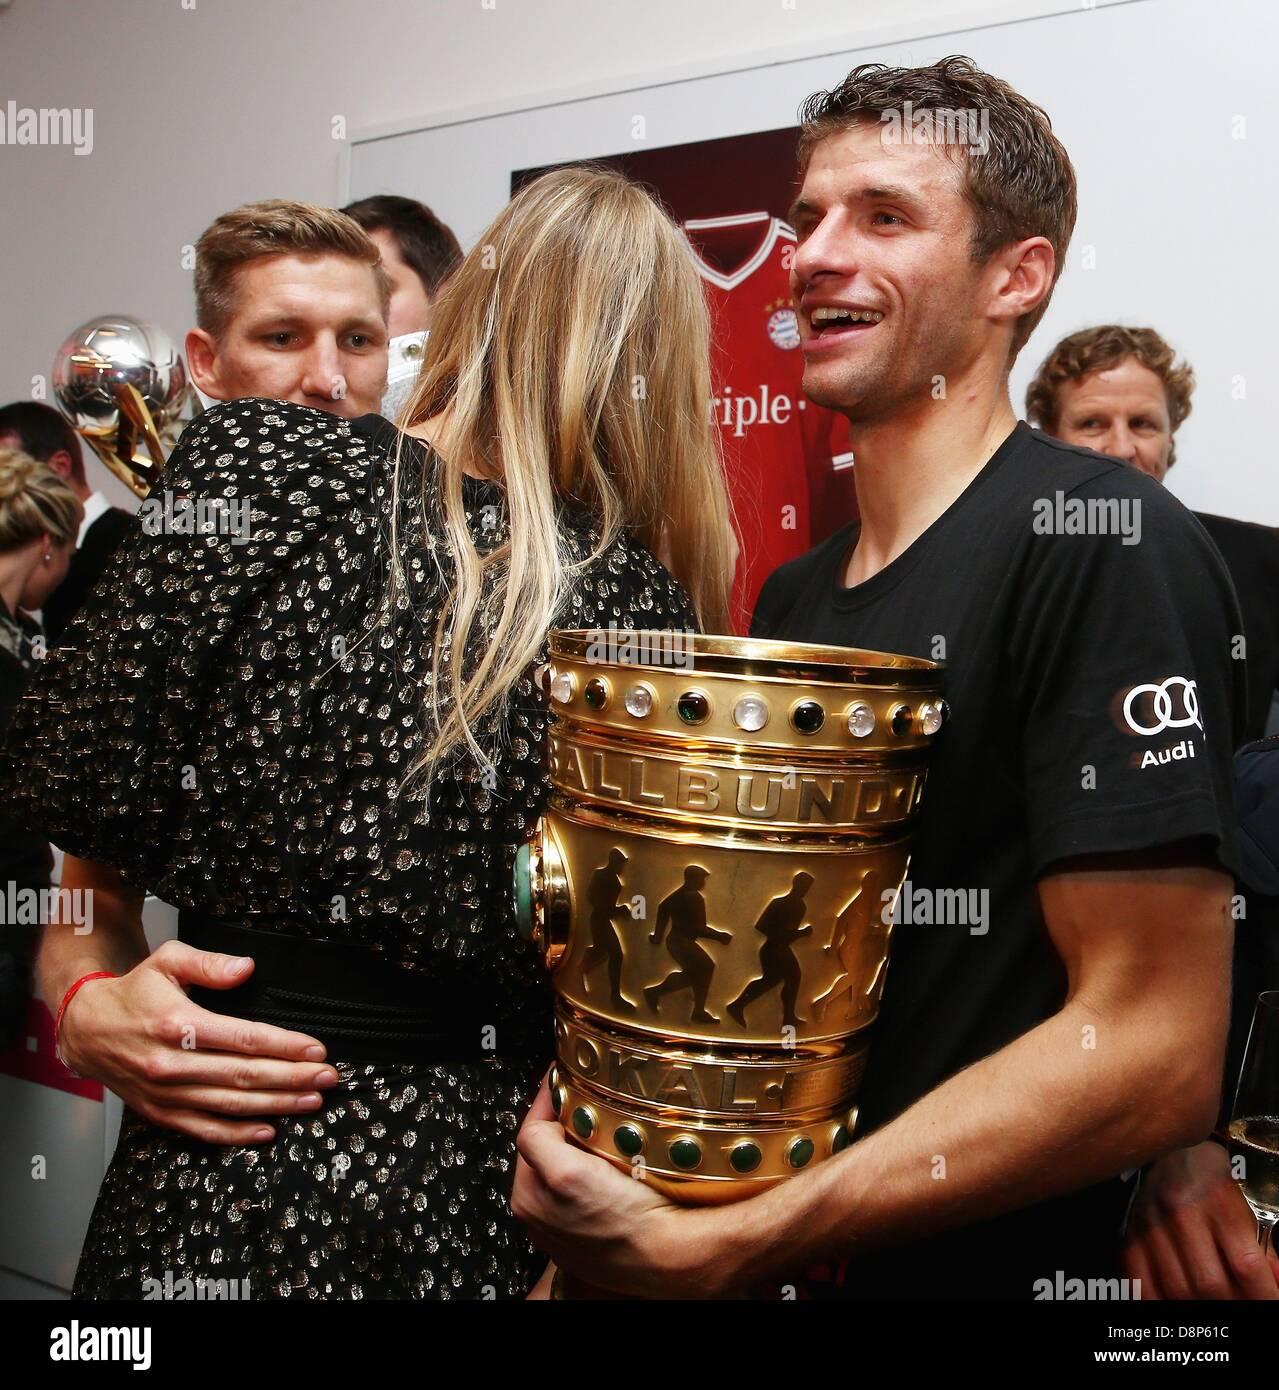 Fc Bayern Munchen Die Saison 2012 2013 Triple 2013 Amazon De